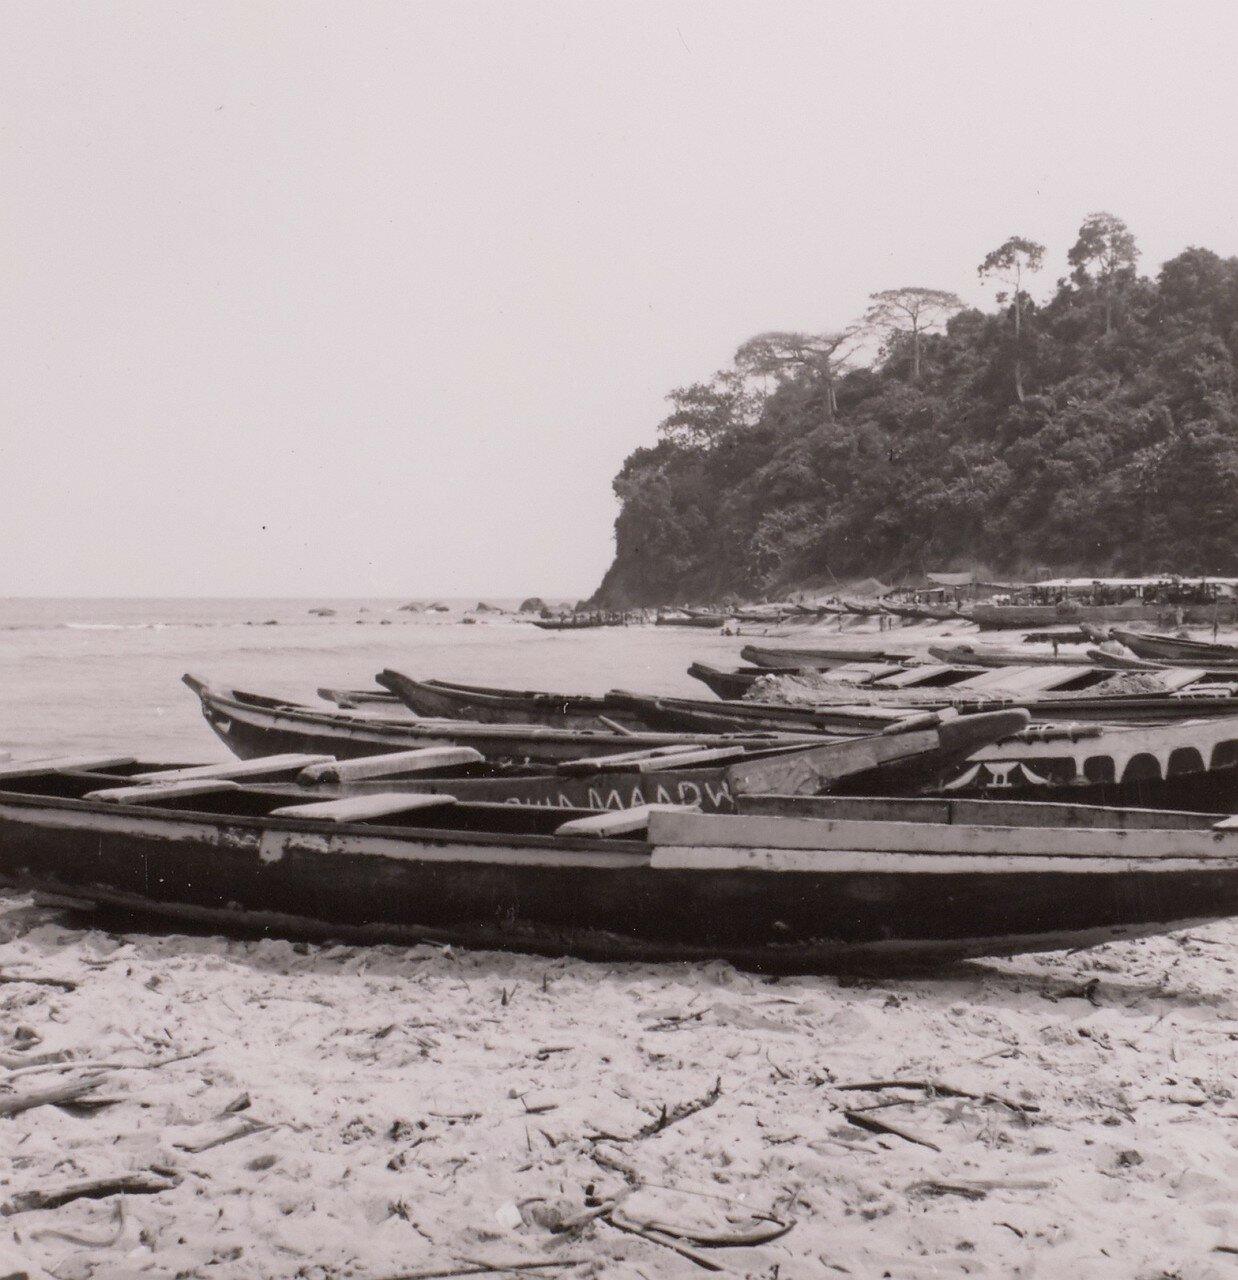 Сасандра. Рыбацкие лодки на берегу